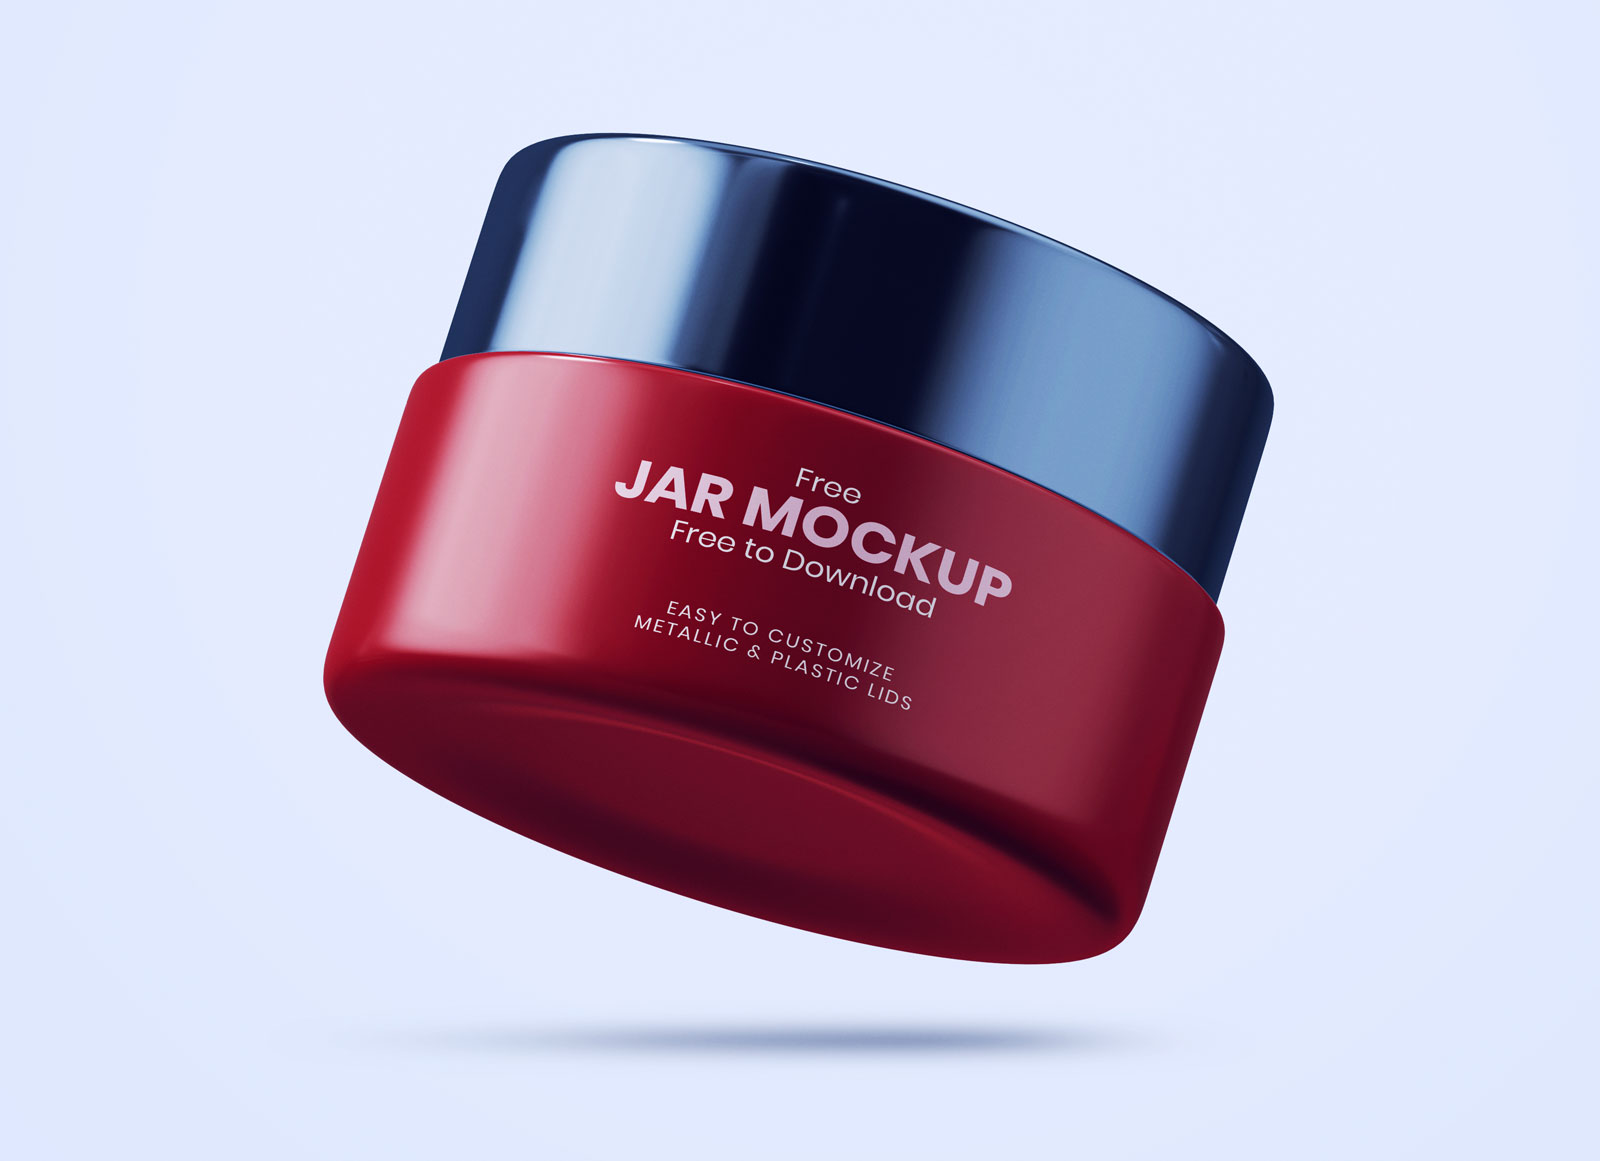 Free-Cosmetic-Cream-Jar-Mockup-PSD-3